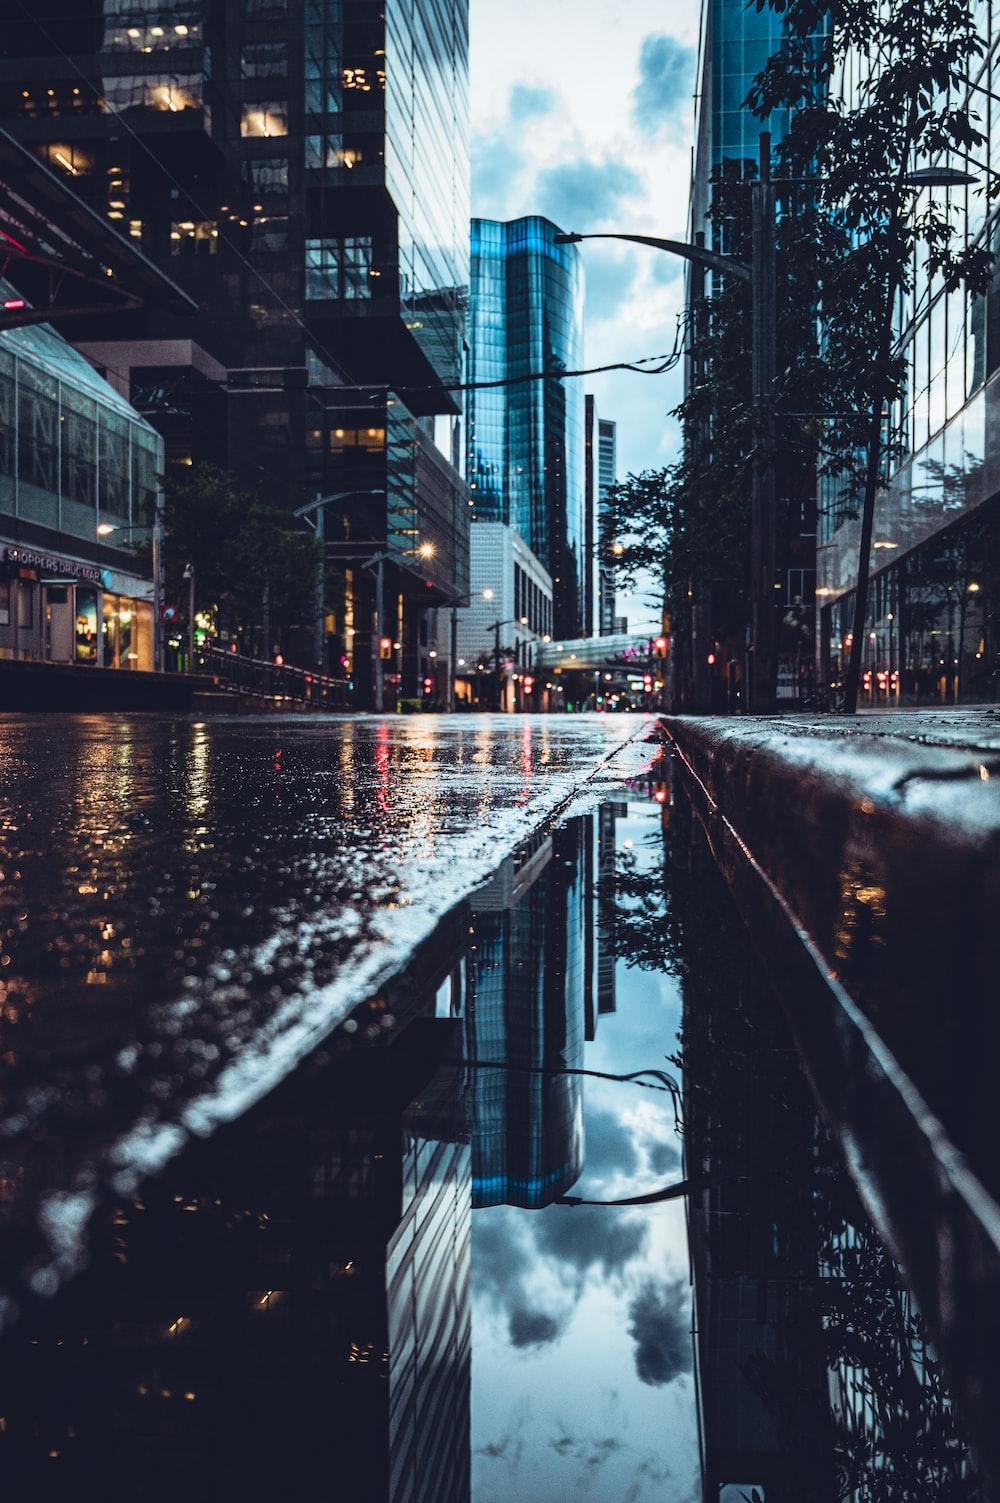 water on road between buildings during daytime